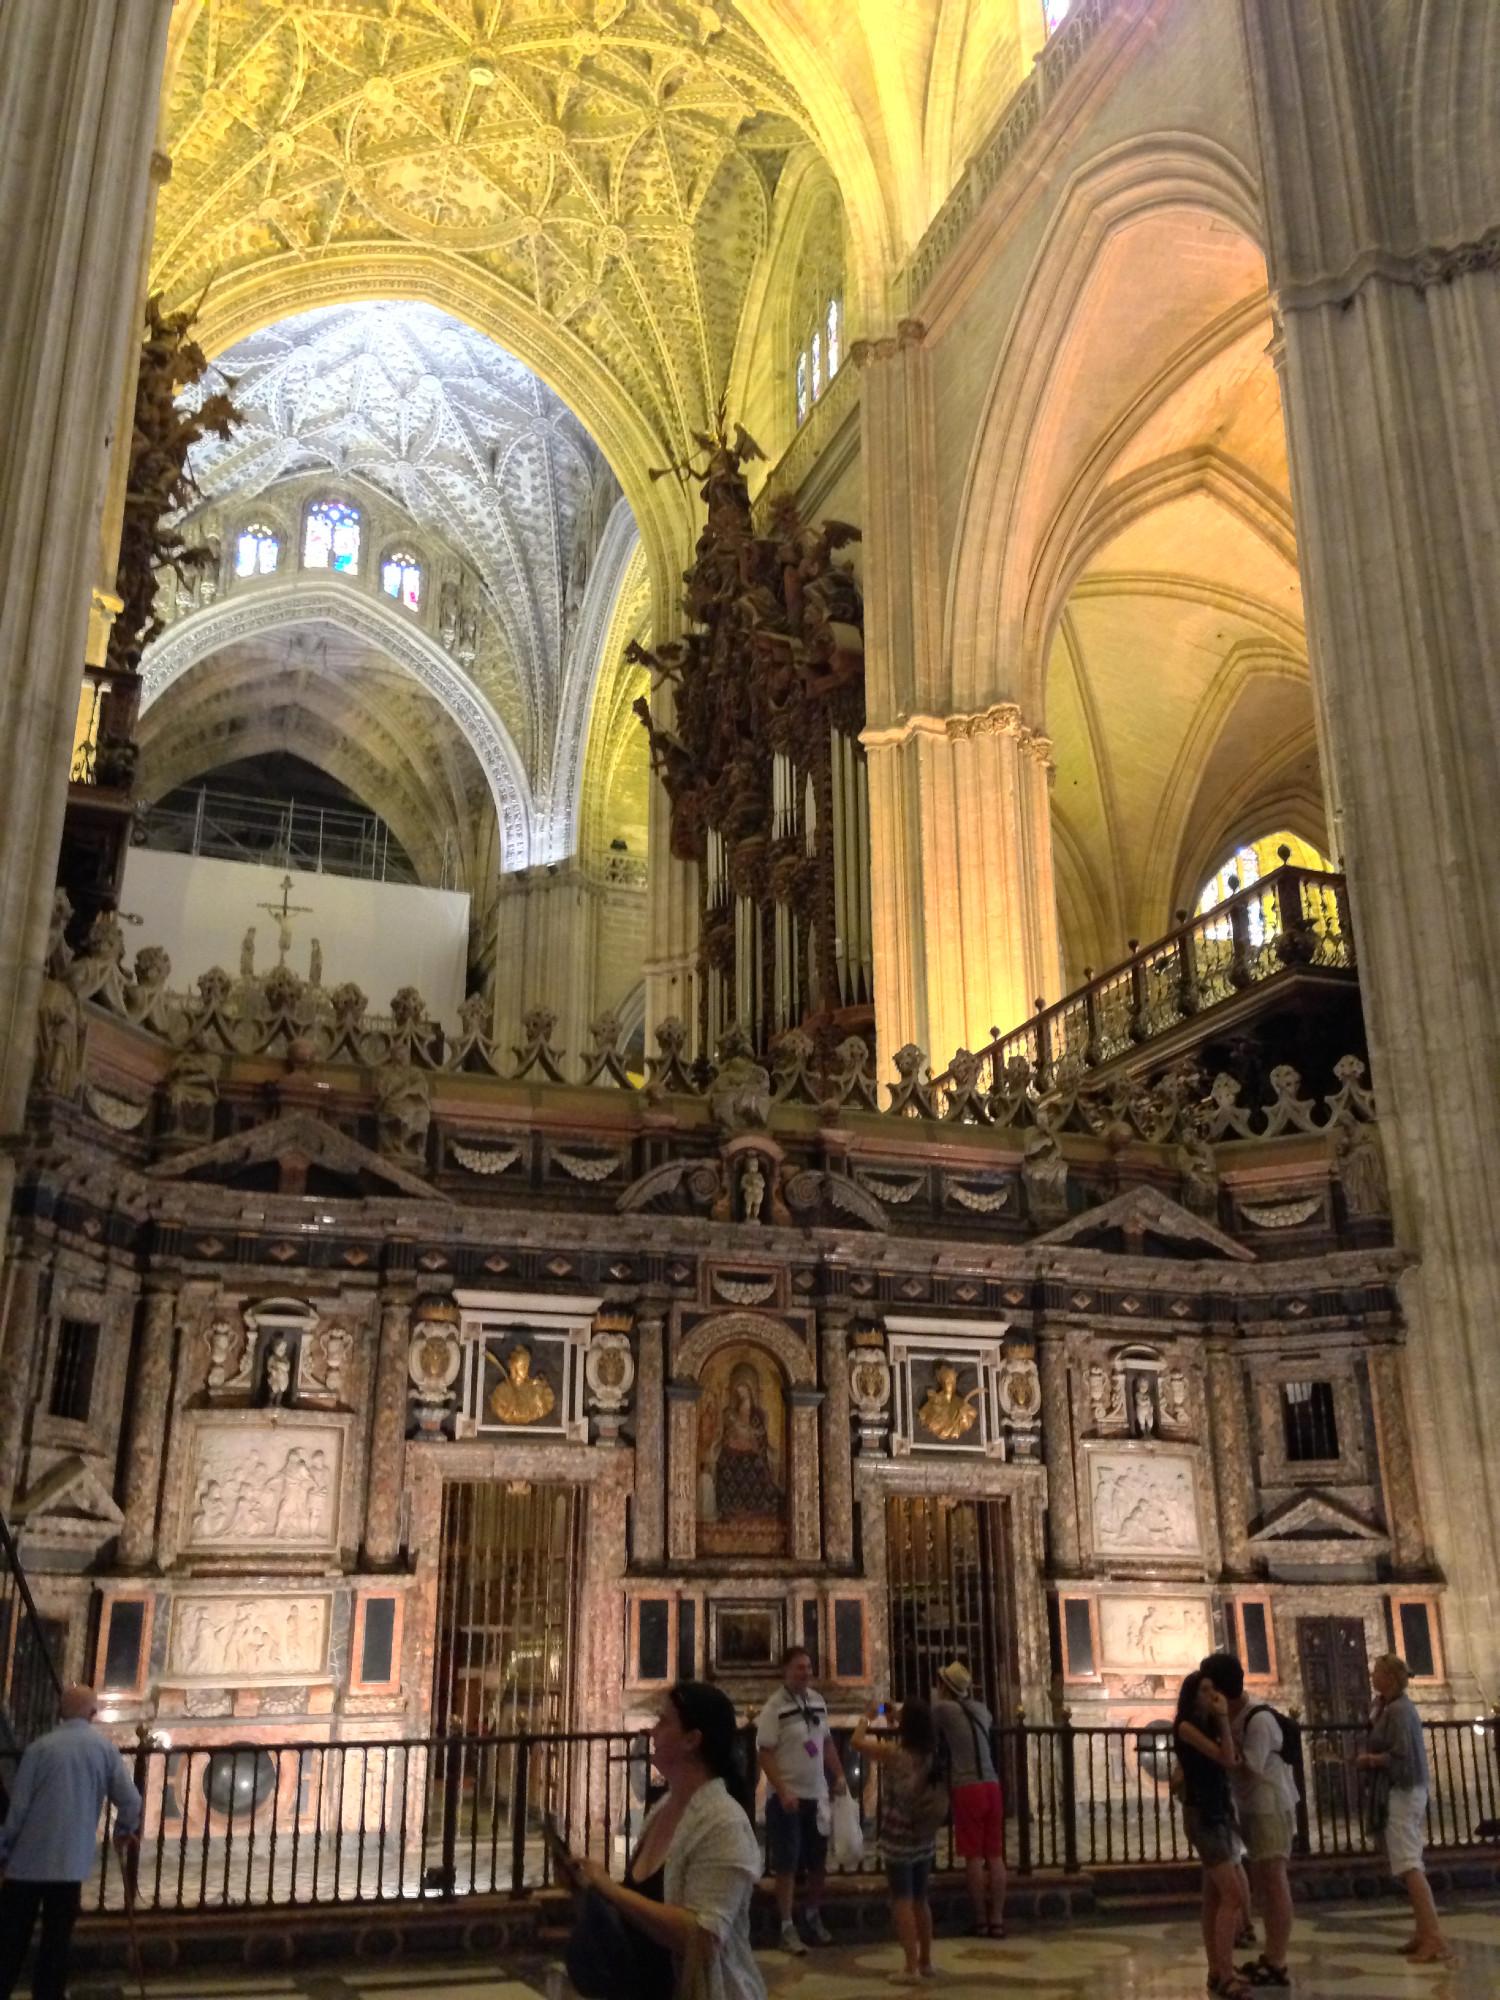 Seville Cathedral, Seville, Spain, Europe